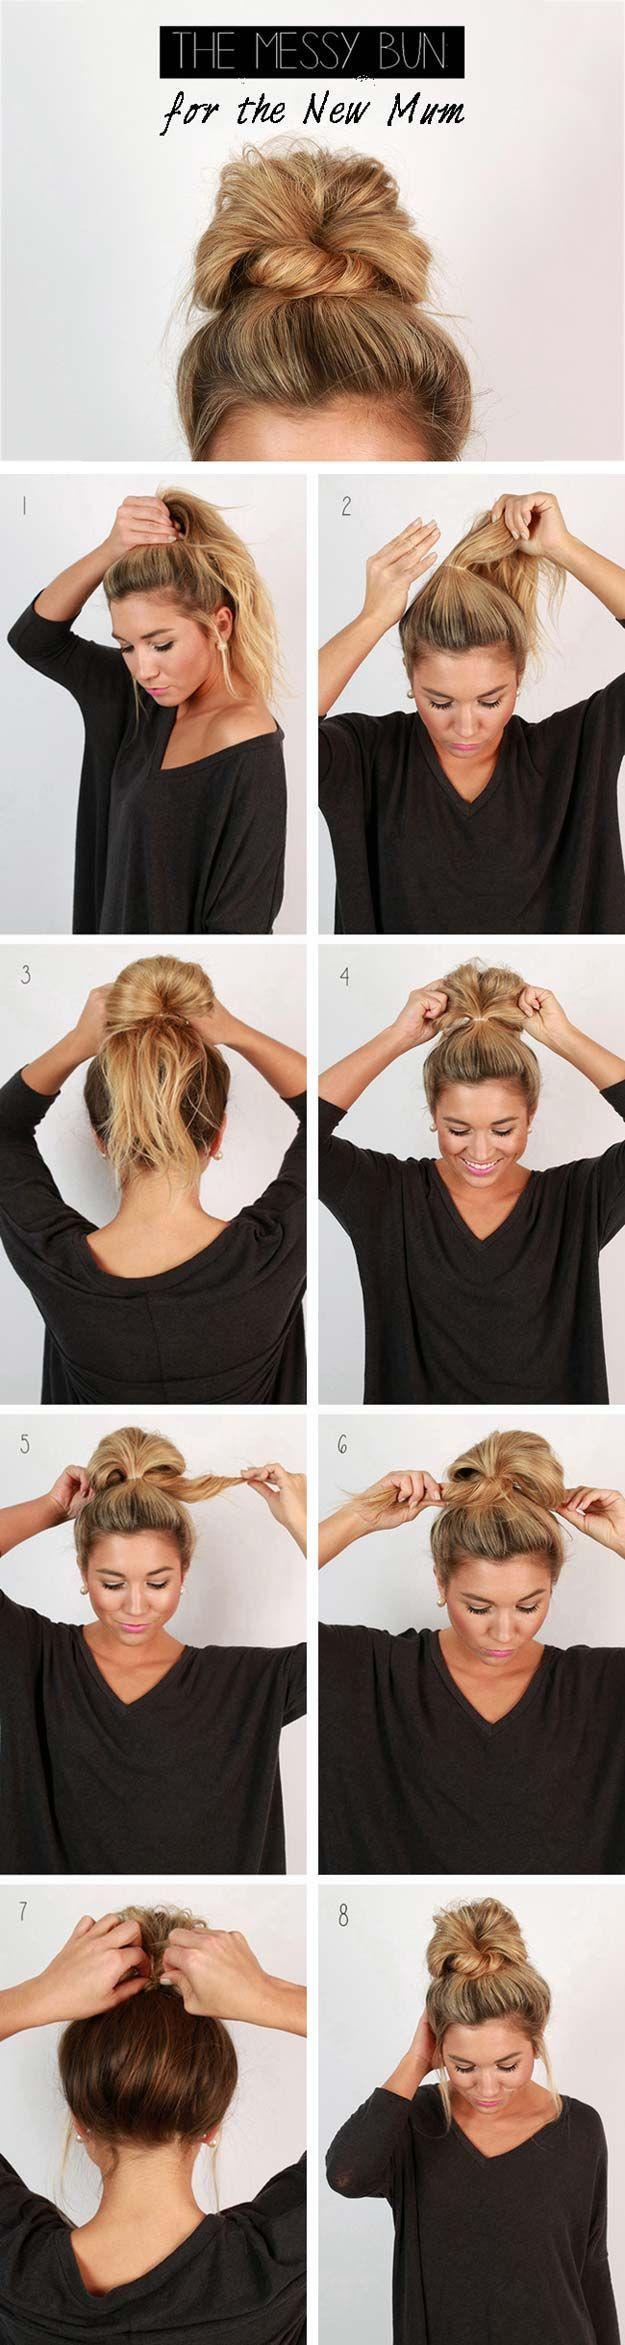 Diy twisted top knot long hair updo bun diy hair knot diy bun 41 diy cool easy hairstyles that real people can actually do at home pmusecretfo Choice Image